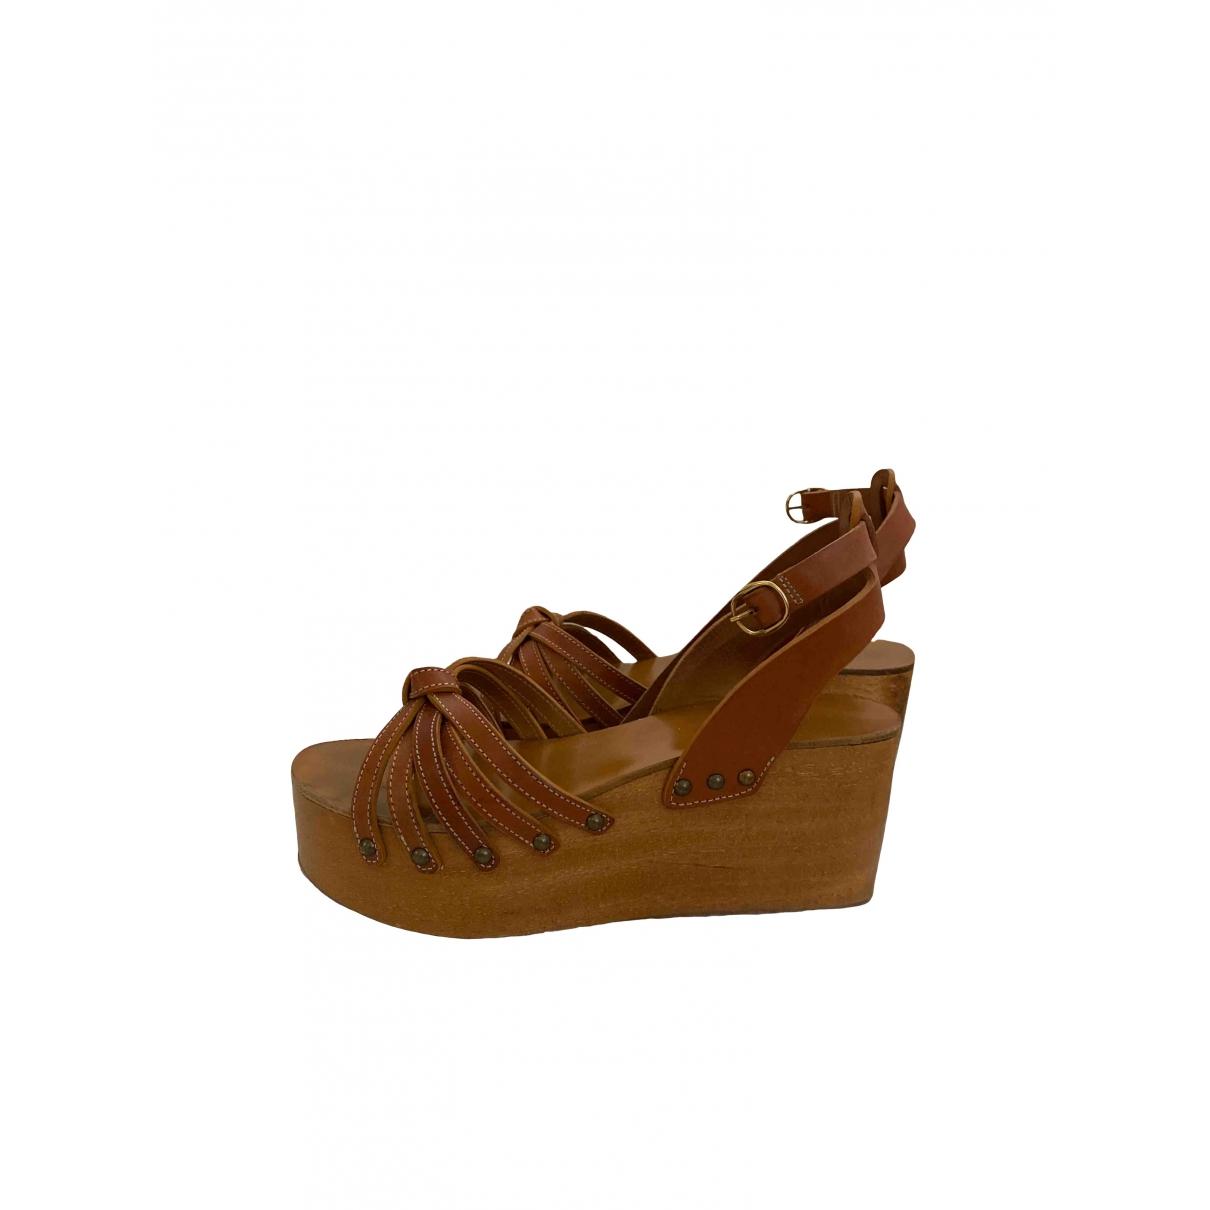 Isabel Marant Etoile \N Camel Fur Sandals for Women 38 EU